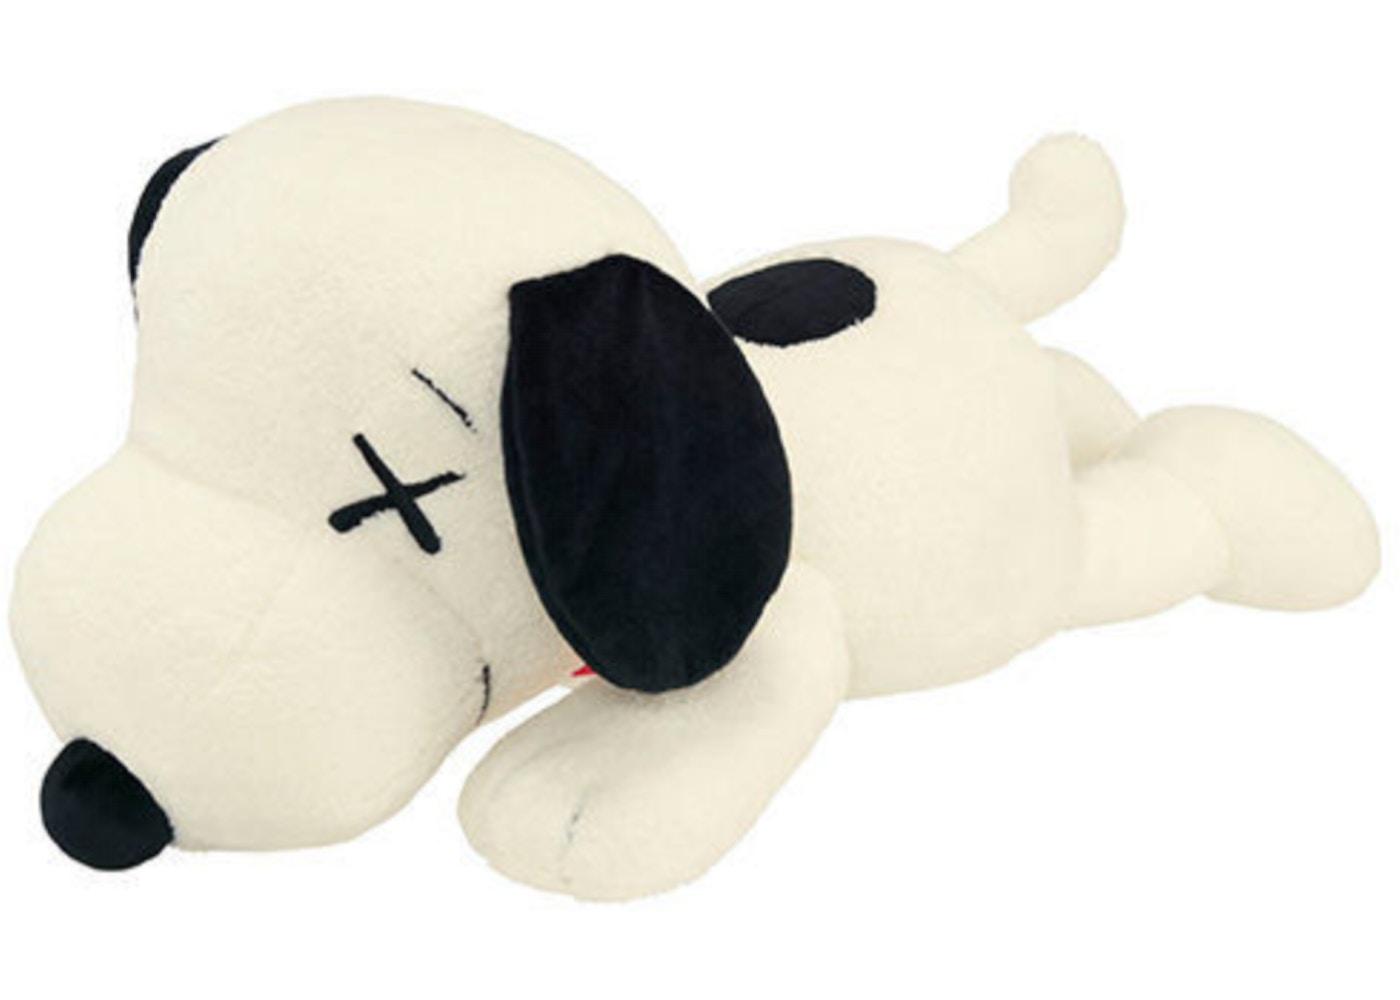 367360e2d8 Kaws x Uniqlo x Peanuts Snoopy Plush (Large) White - SS17